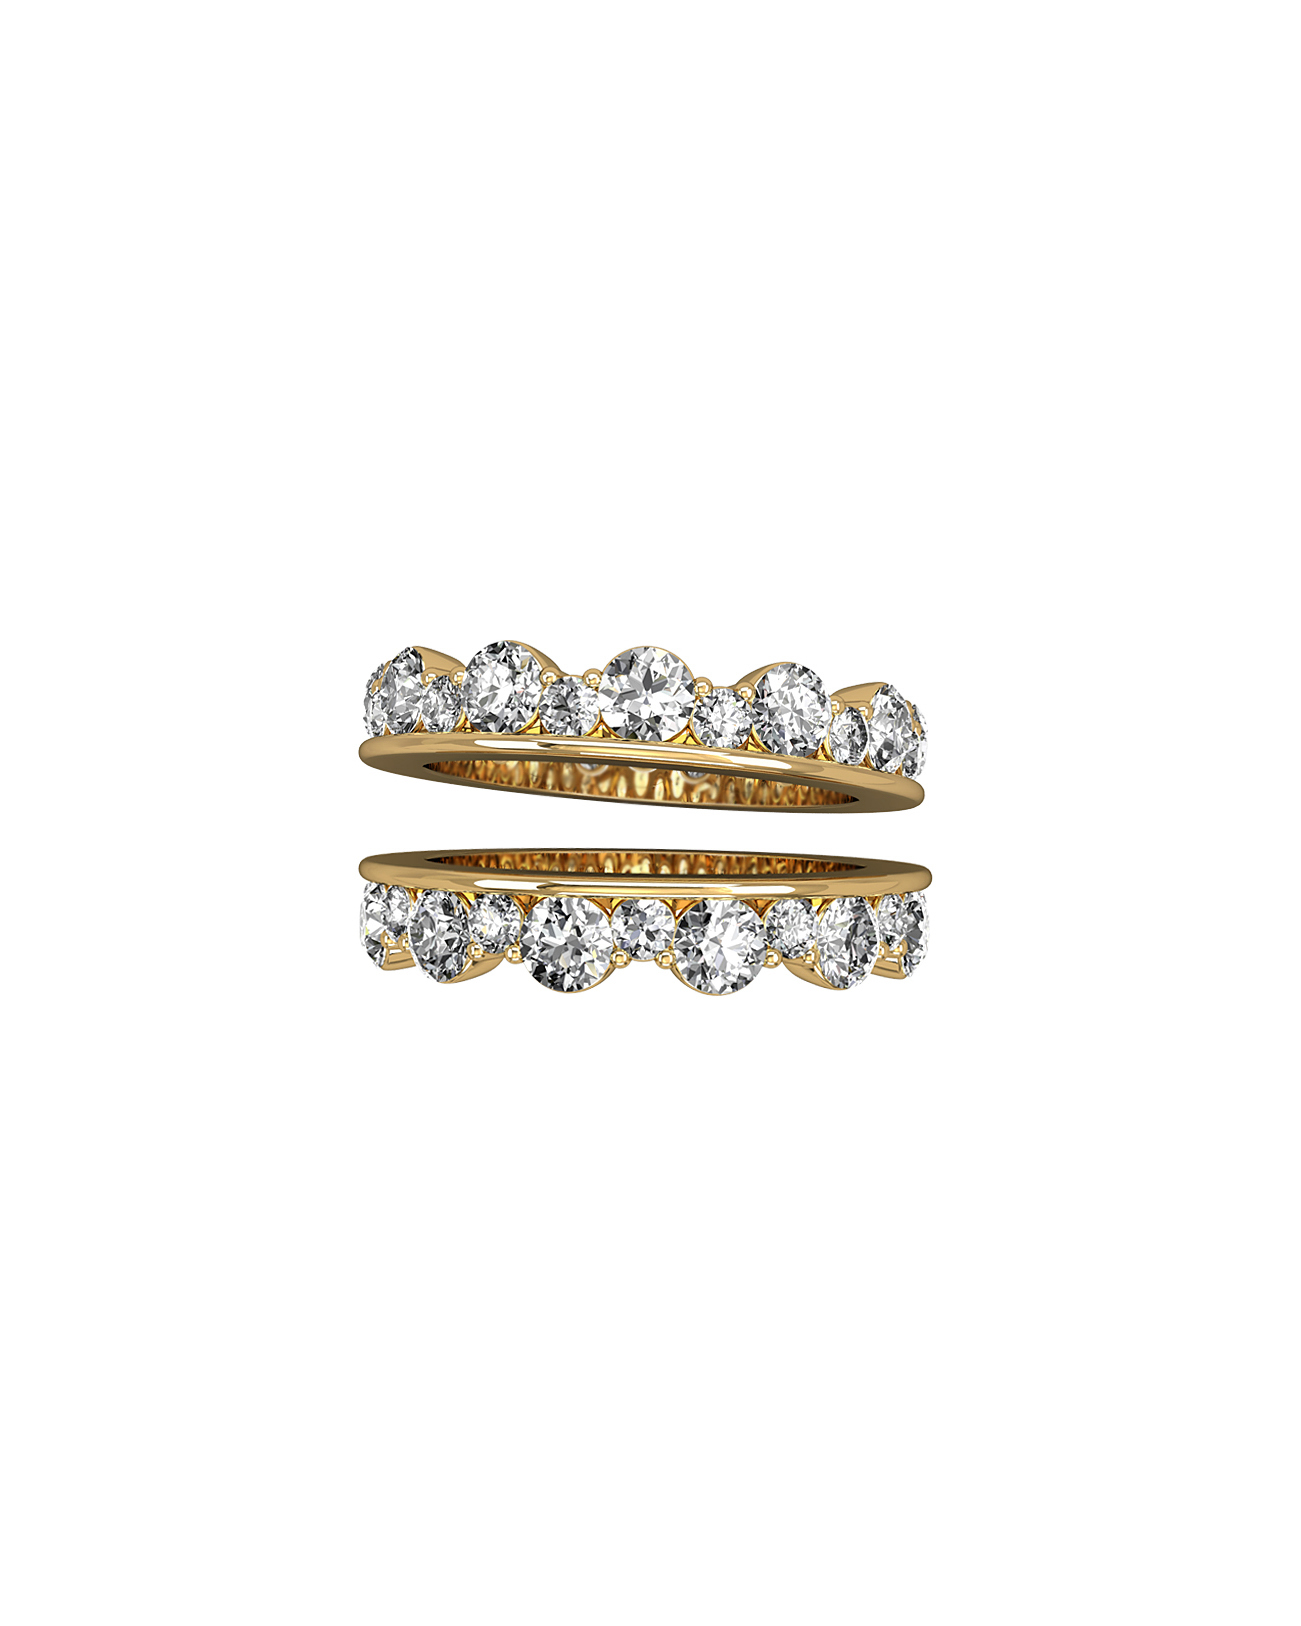 designer diamond bridal jewelry-1-8.jpg